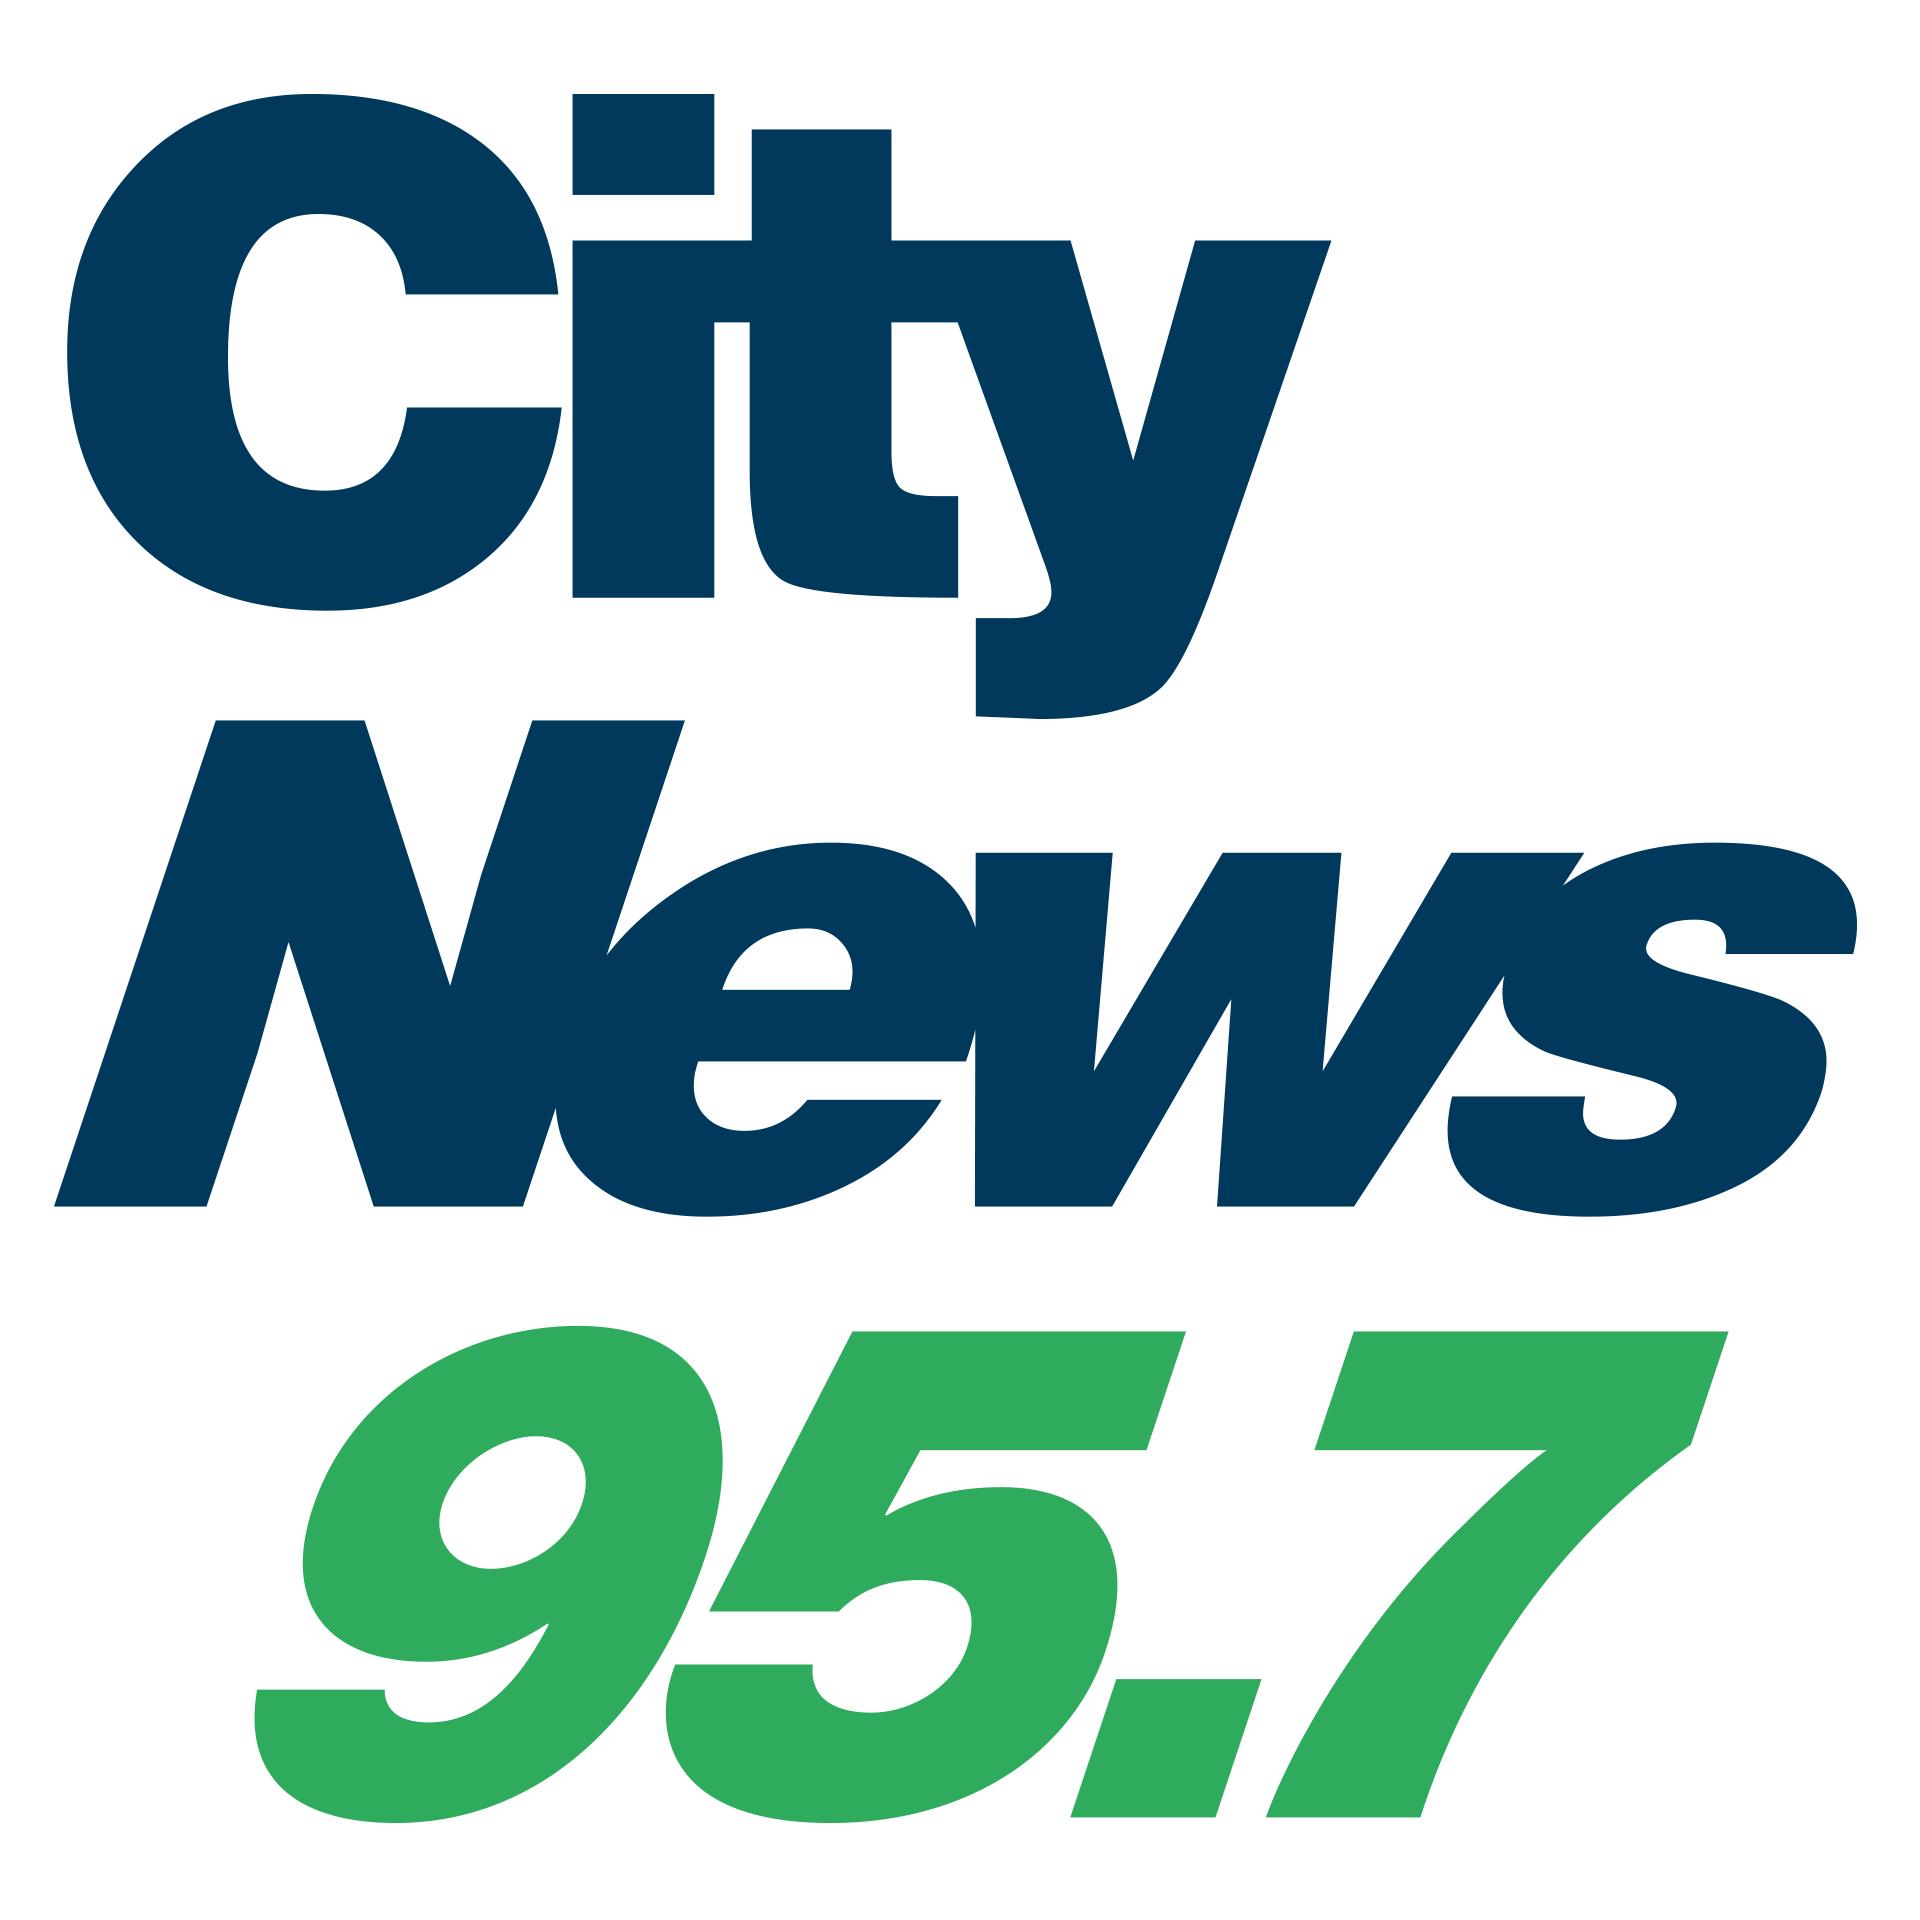 Citynews 957 radioplayer 1920